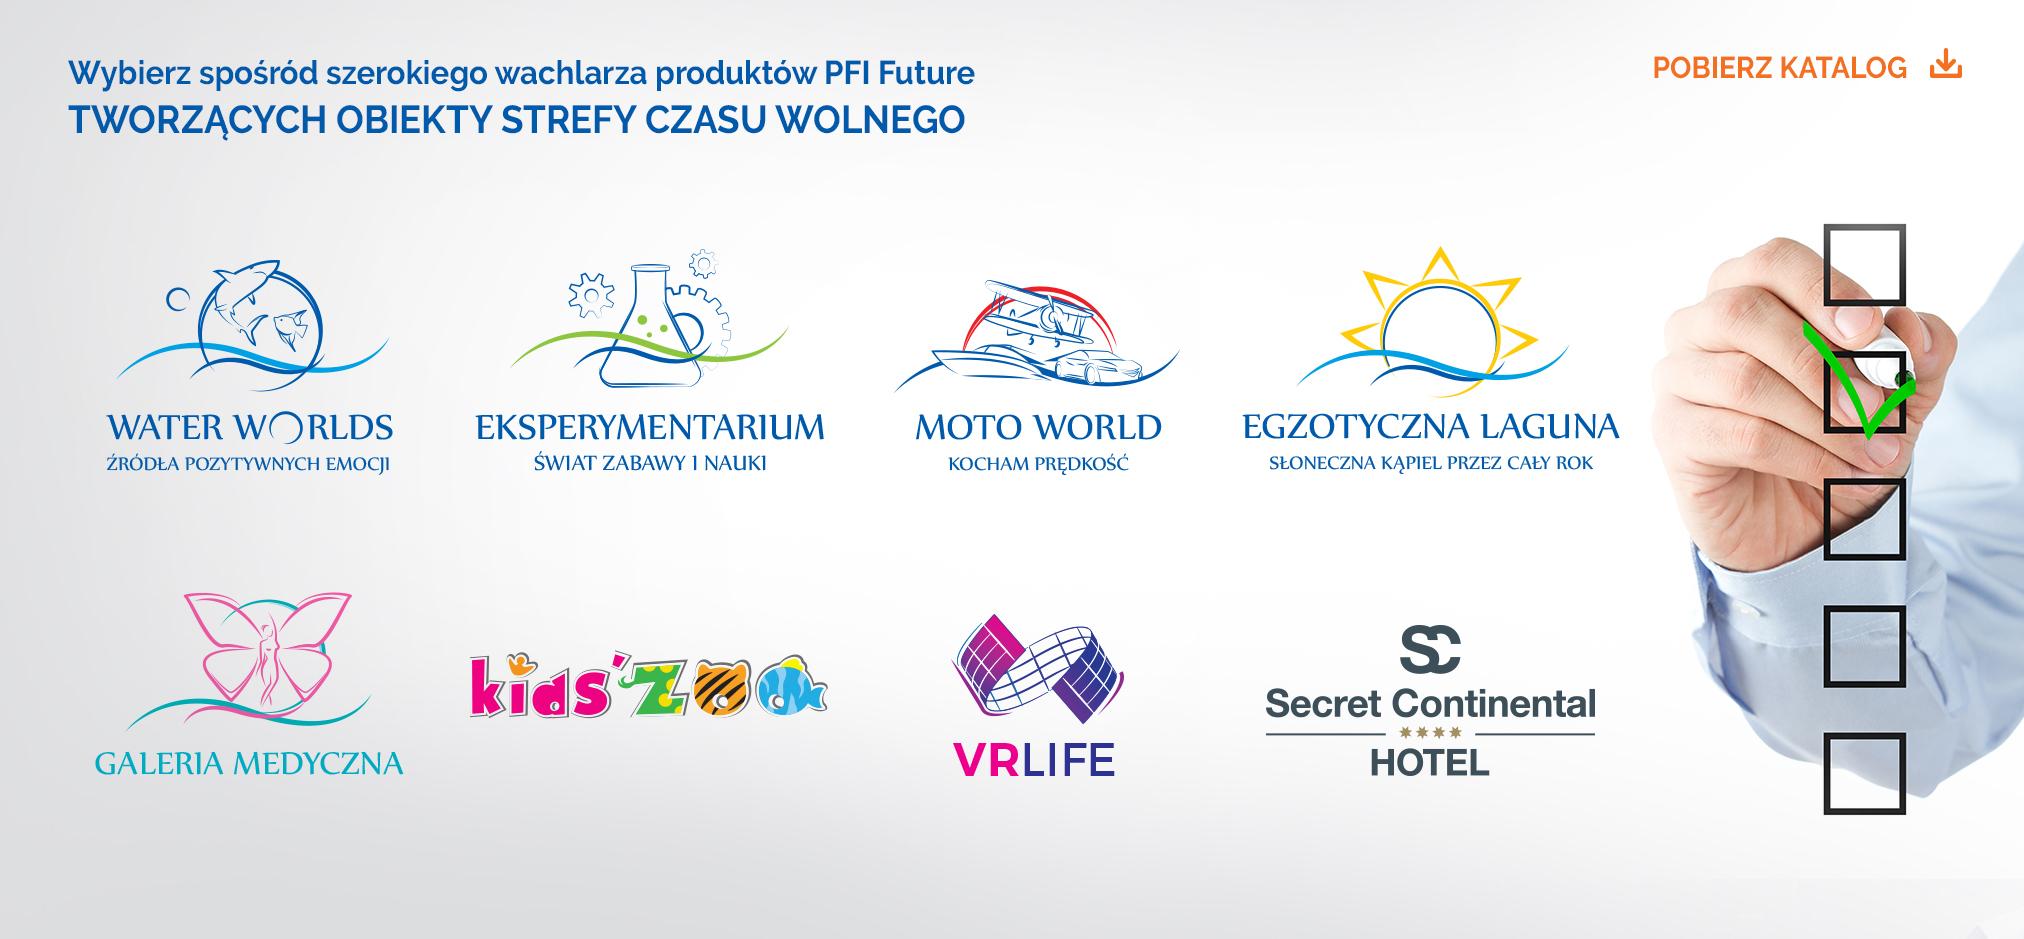 PFI FUTURE – Slider Produkty Pl